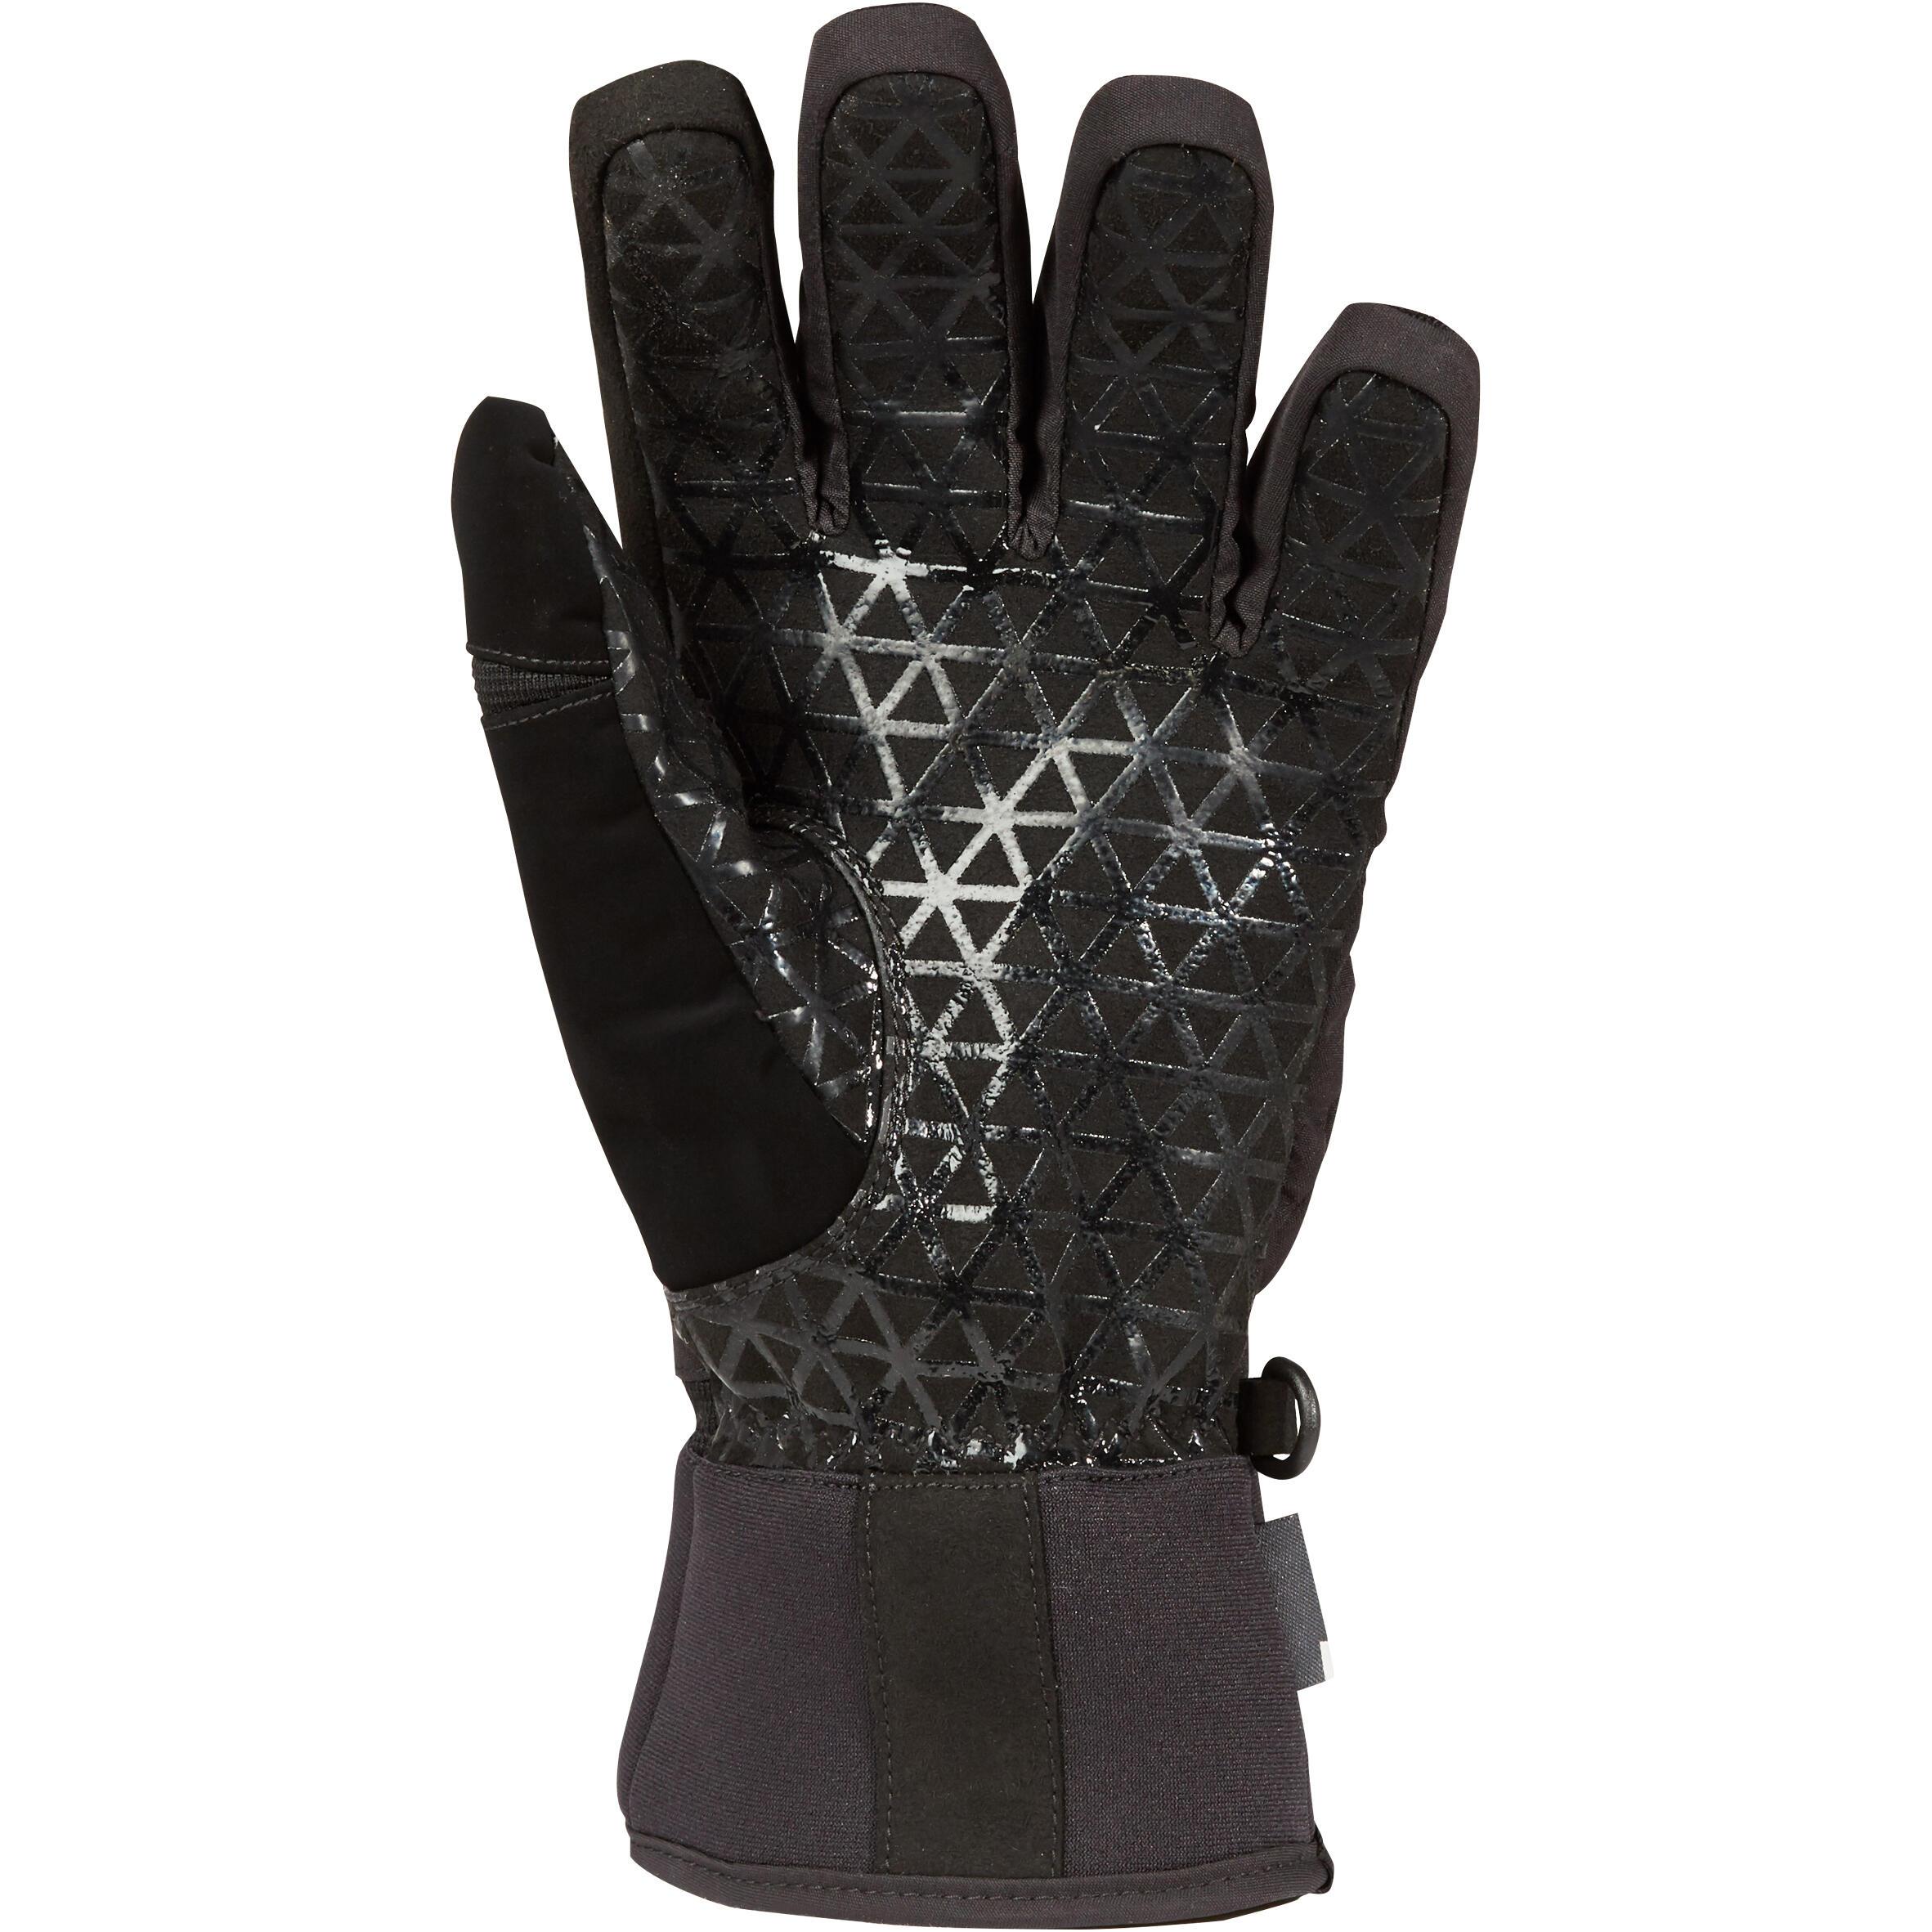 SNB GL 500 Snowboard and Ski Gloves - Black